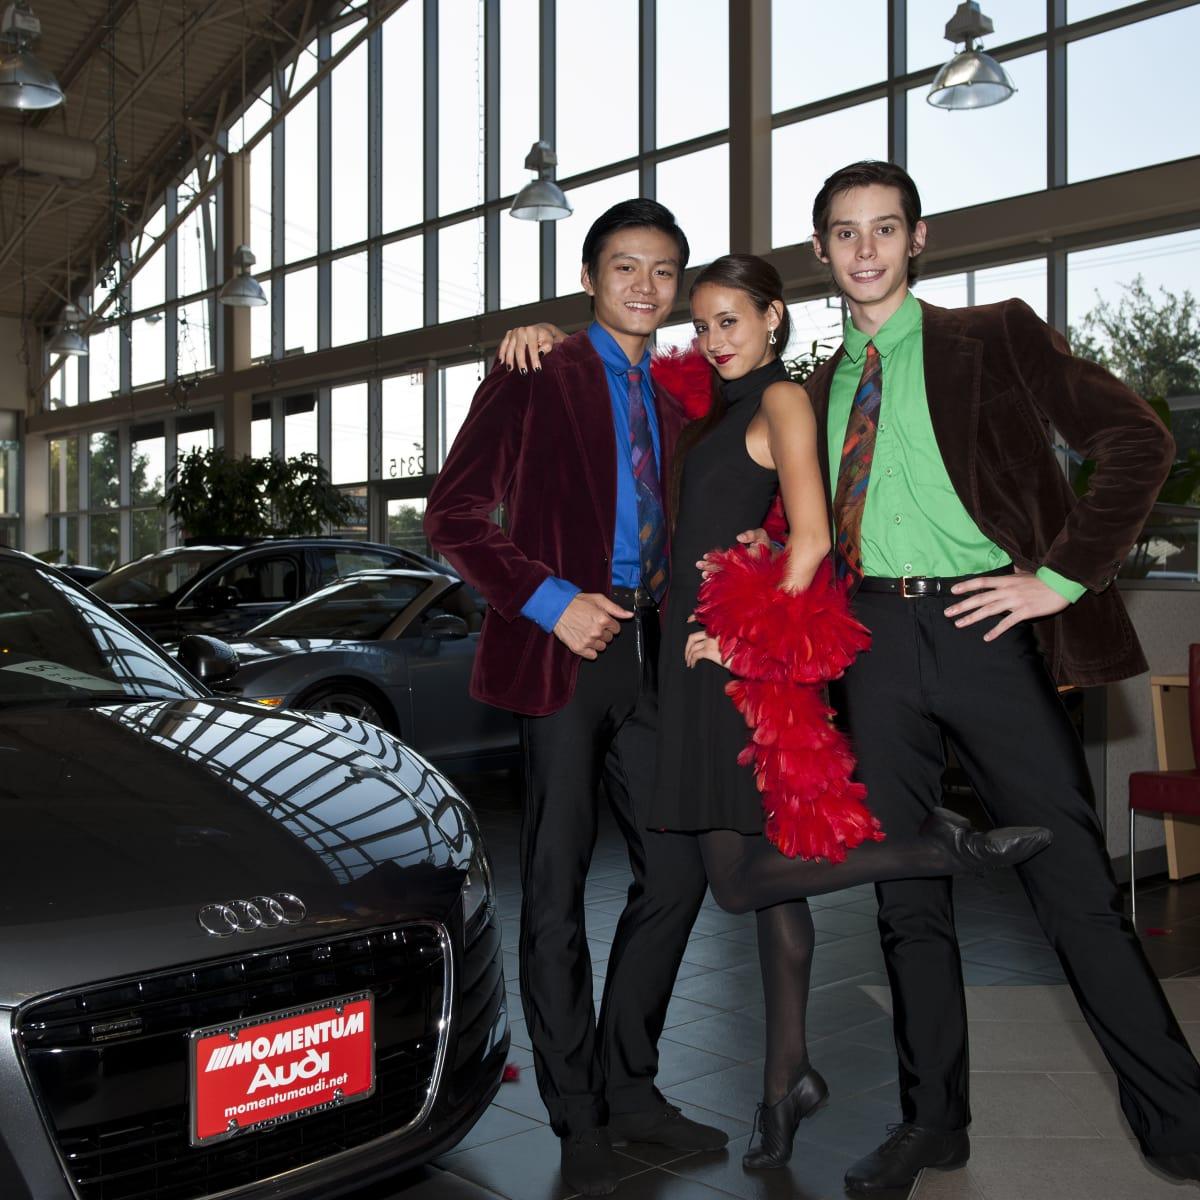 News_Ballet Barre_Liana Carpio_Guillaume Basso_Chunwai Chan, June 2011